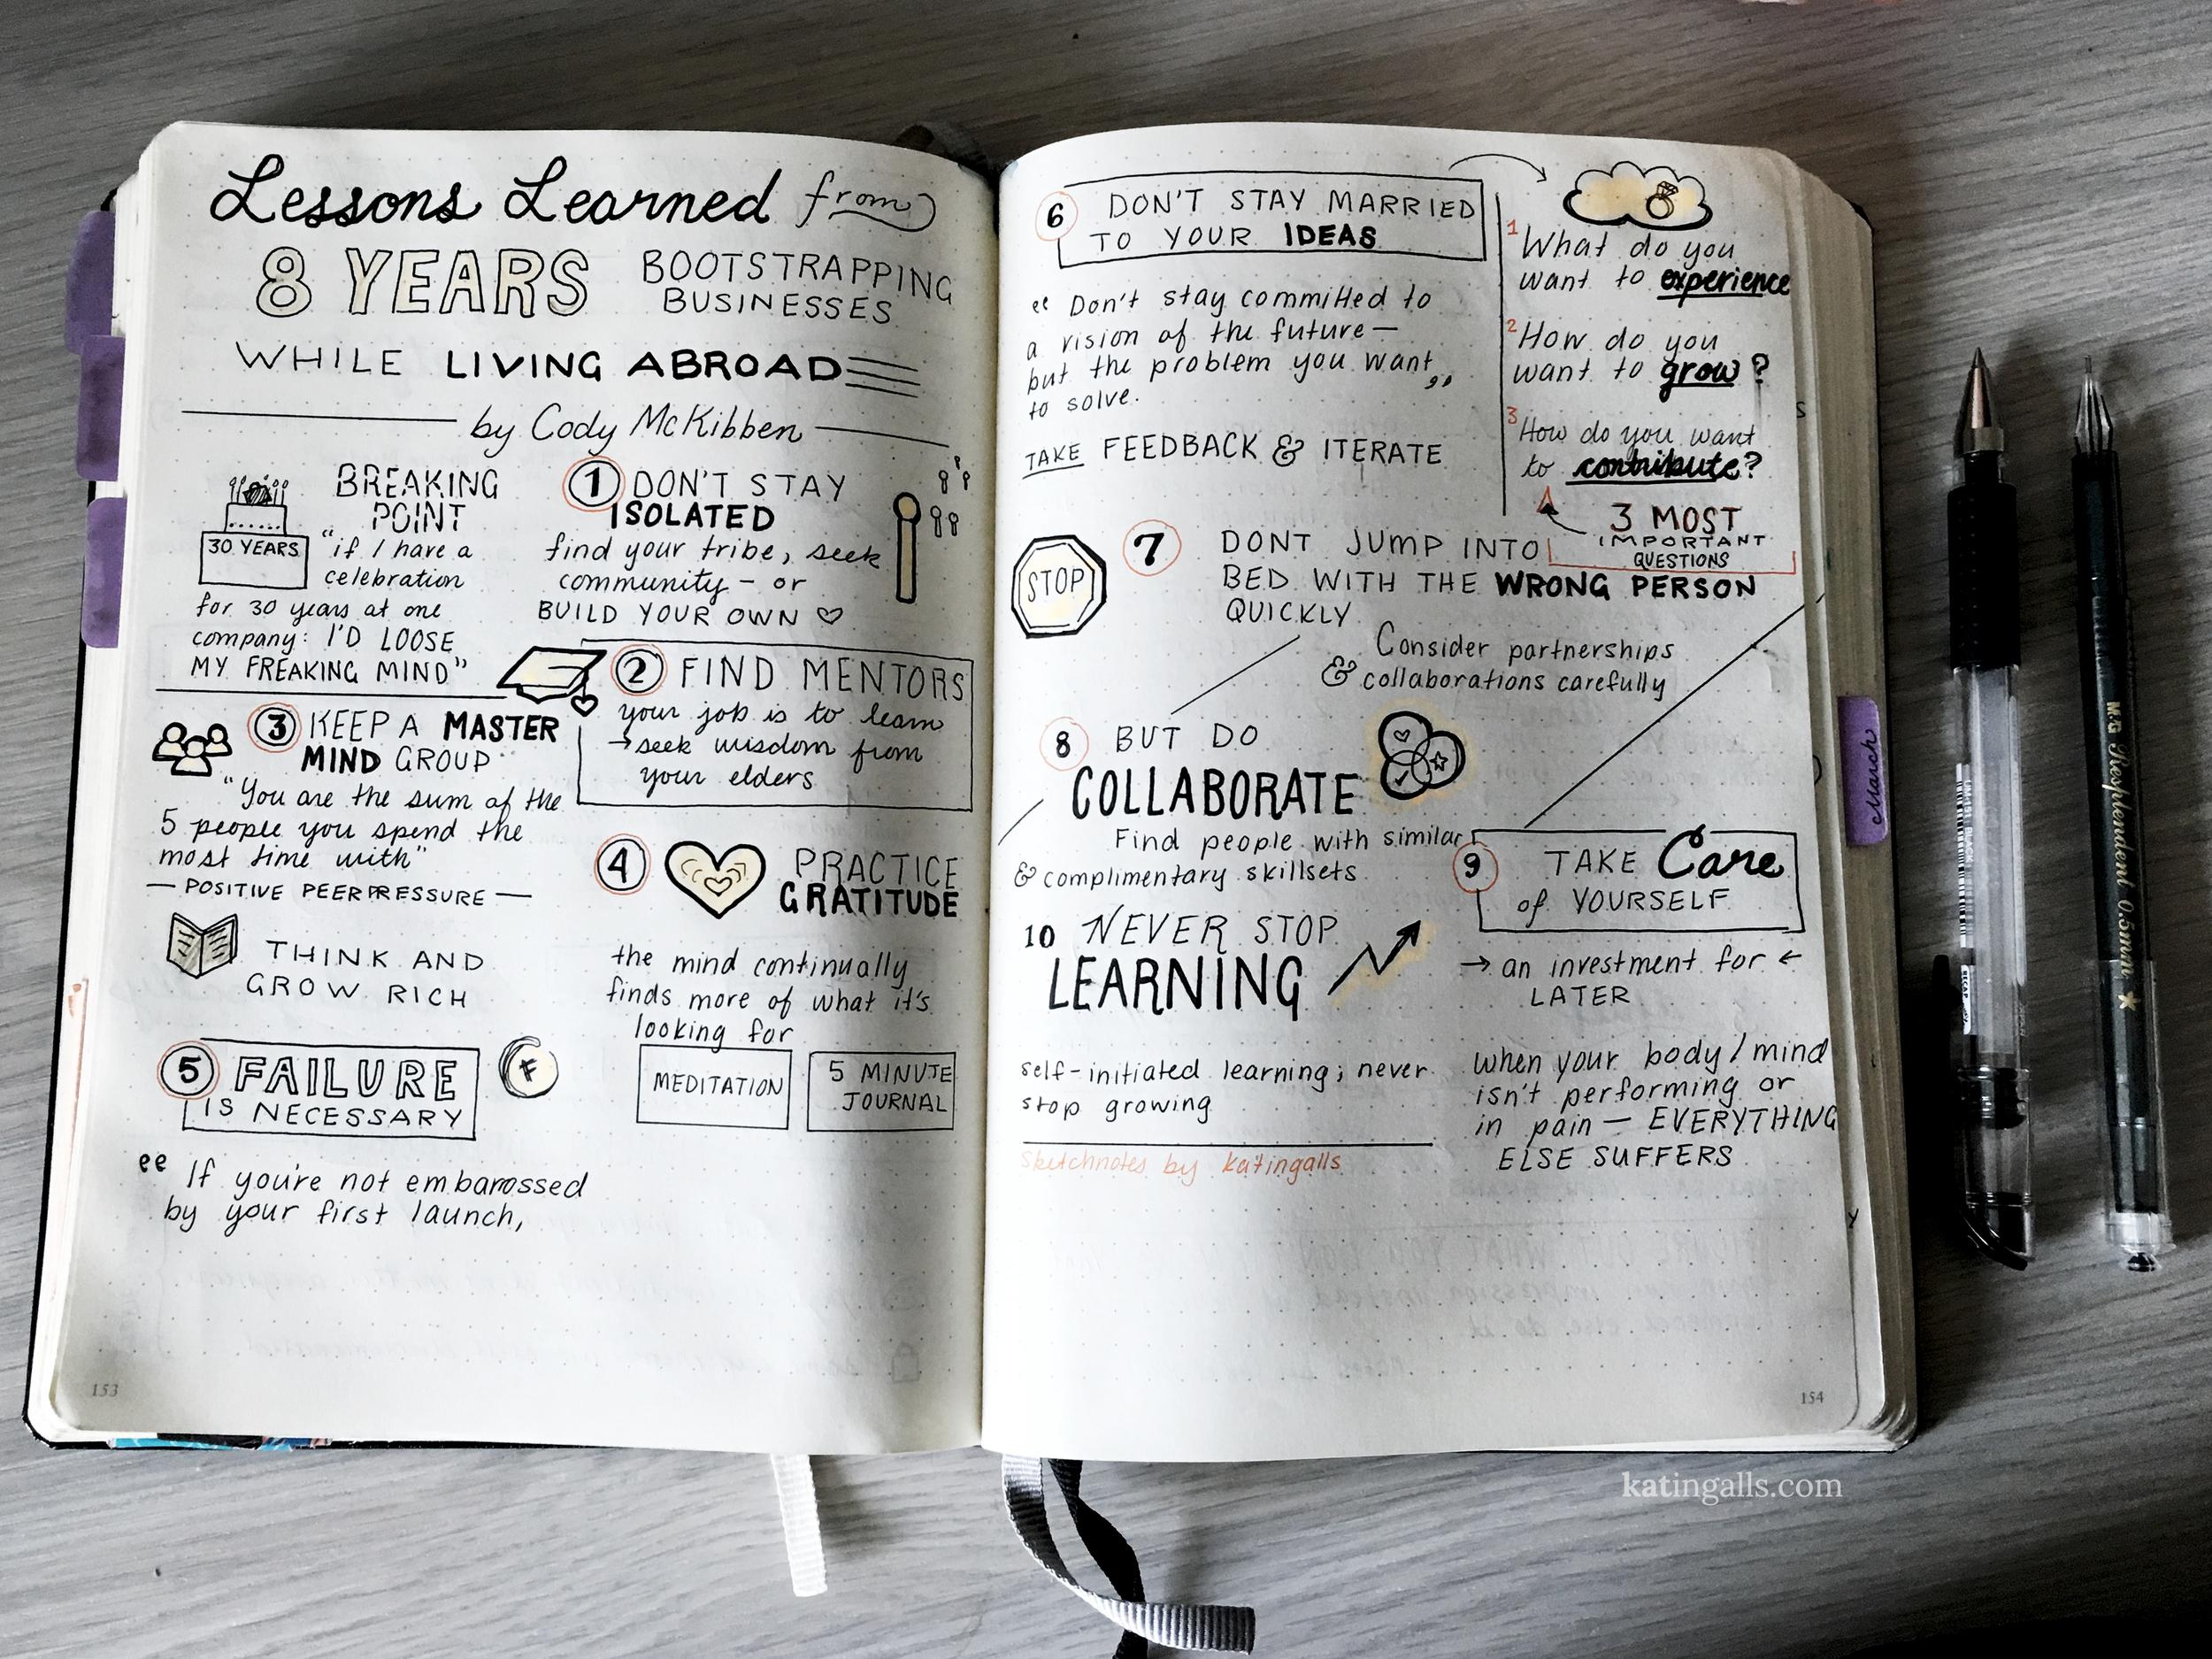 Sketchnotes from Digital Nomad Summit 2016 by Kat Ingalls // Talk by Cody McKibben